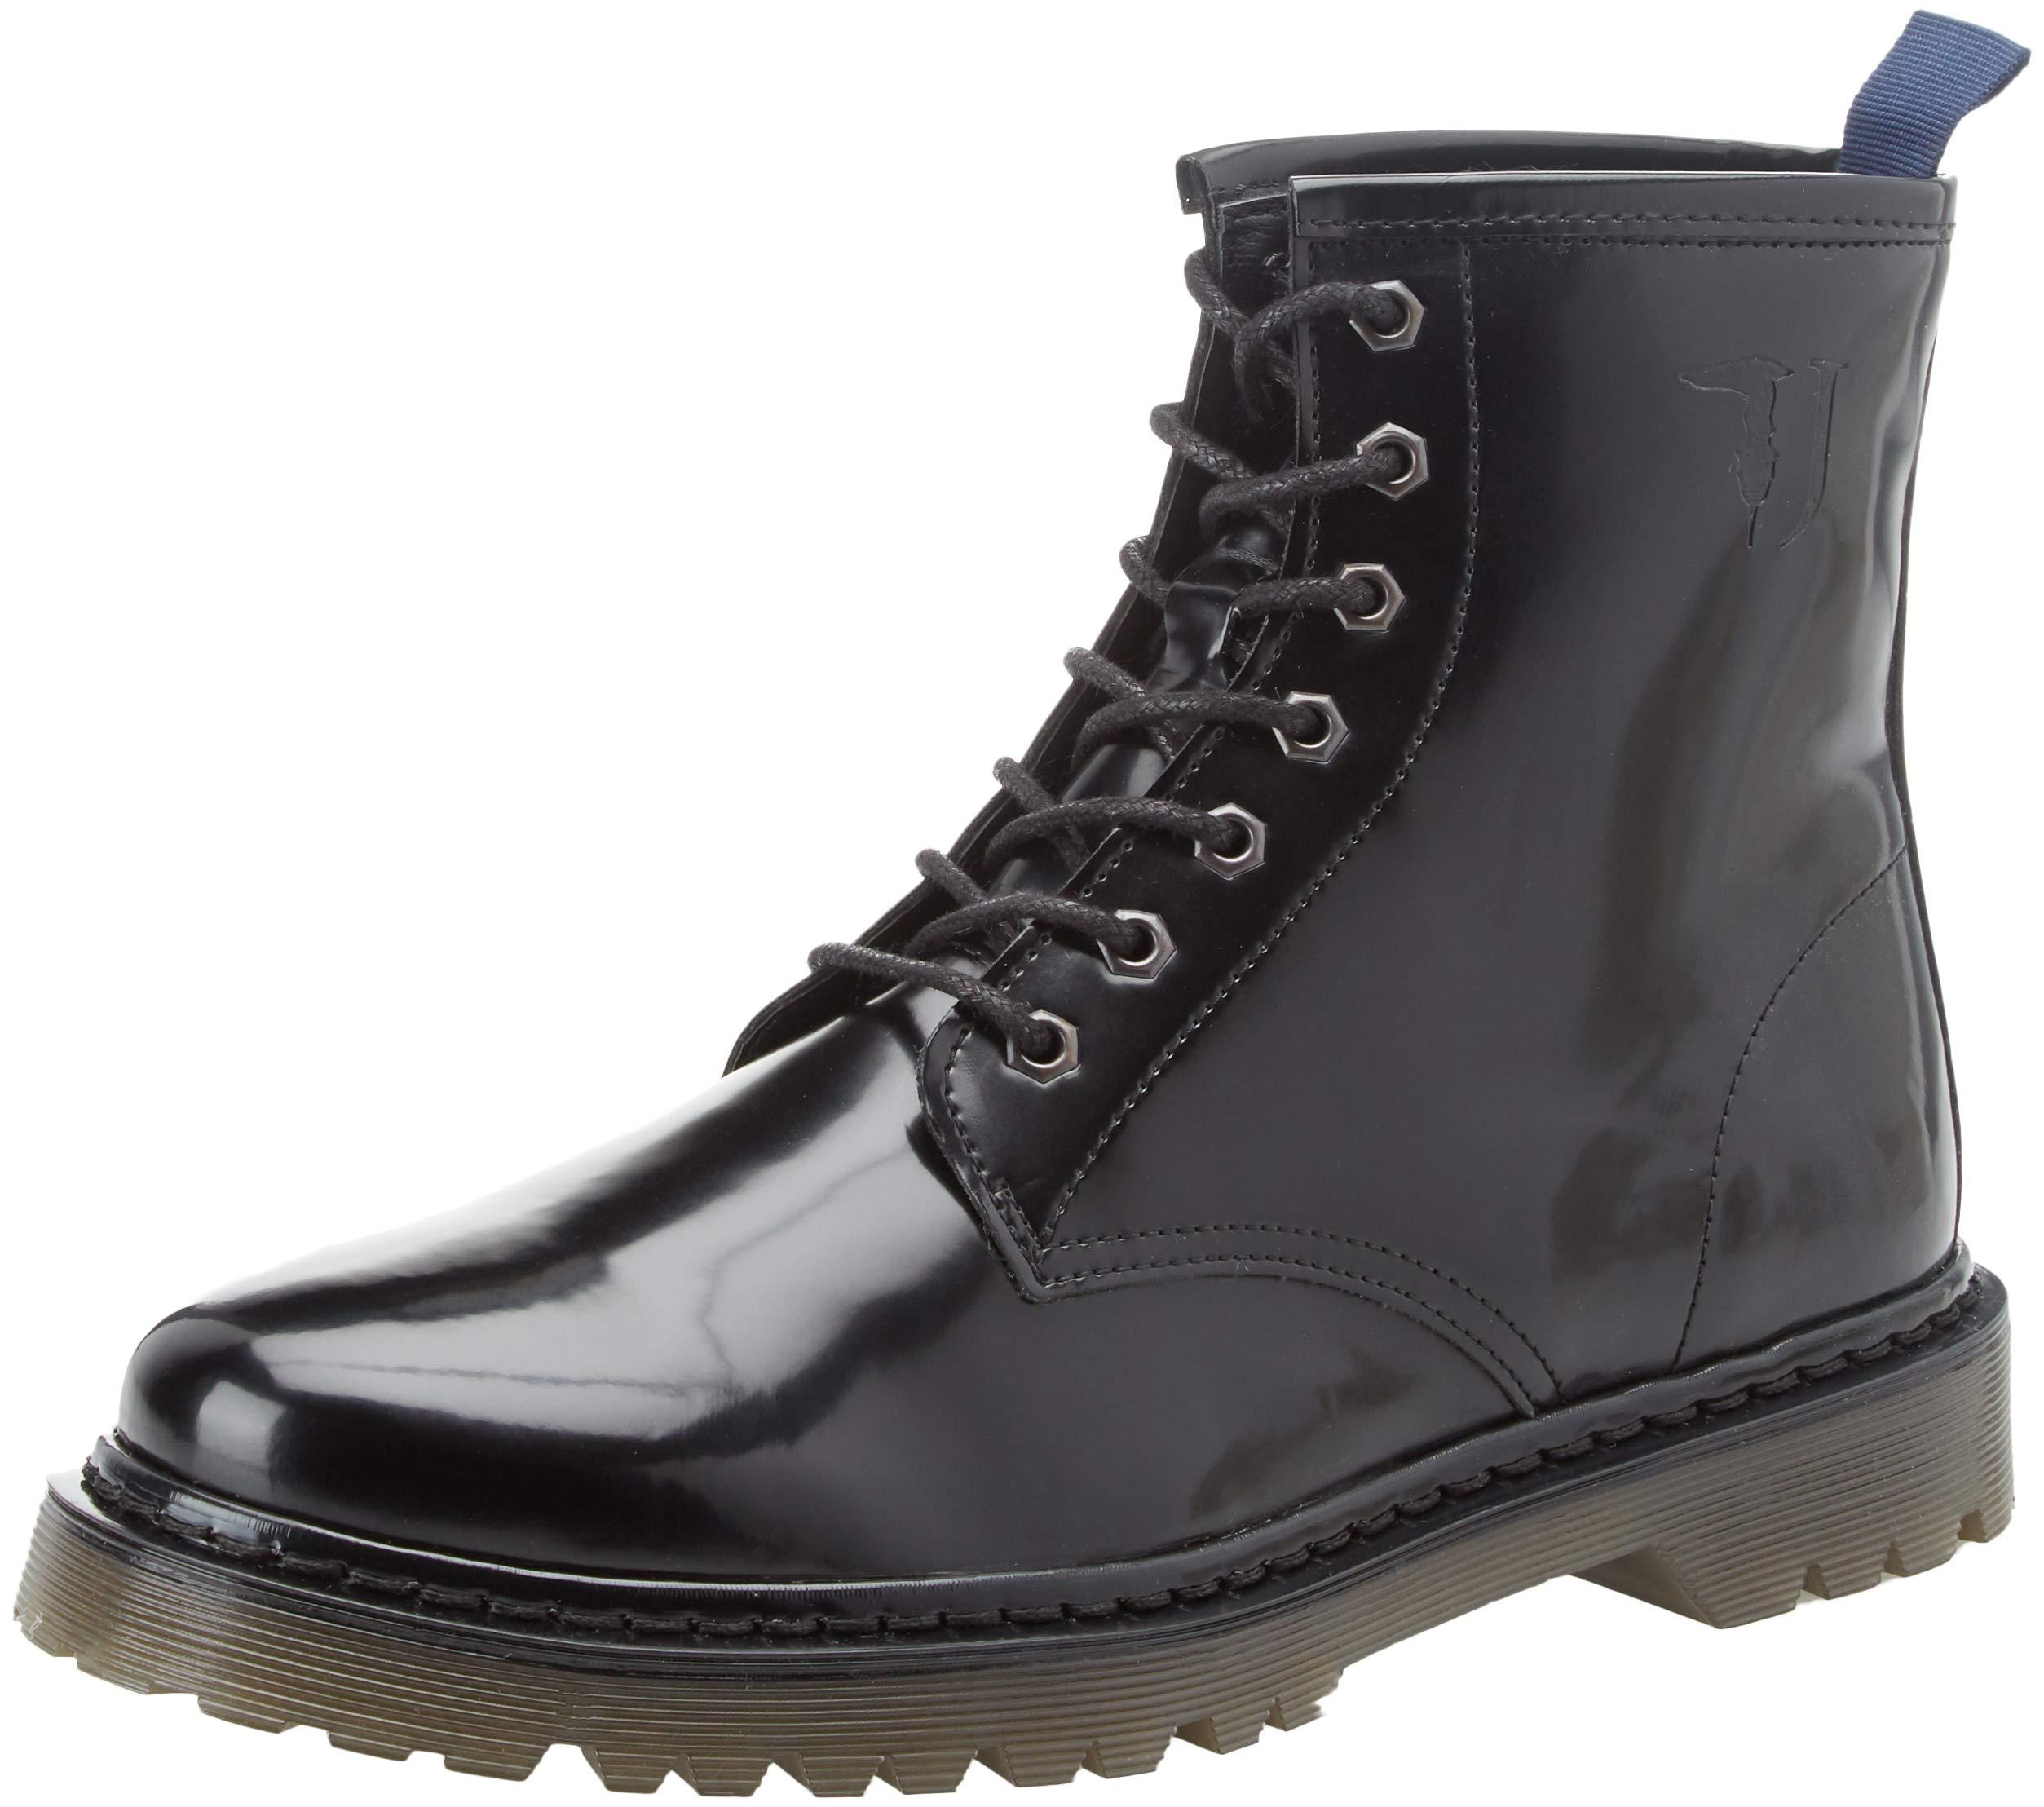 Rangers HommeNoirneroblack7779K29943 Boot Pyramid Eu Jeans Trussardi Combat Bottines StudsBottesamp; nOPX80kw